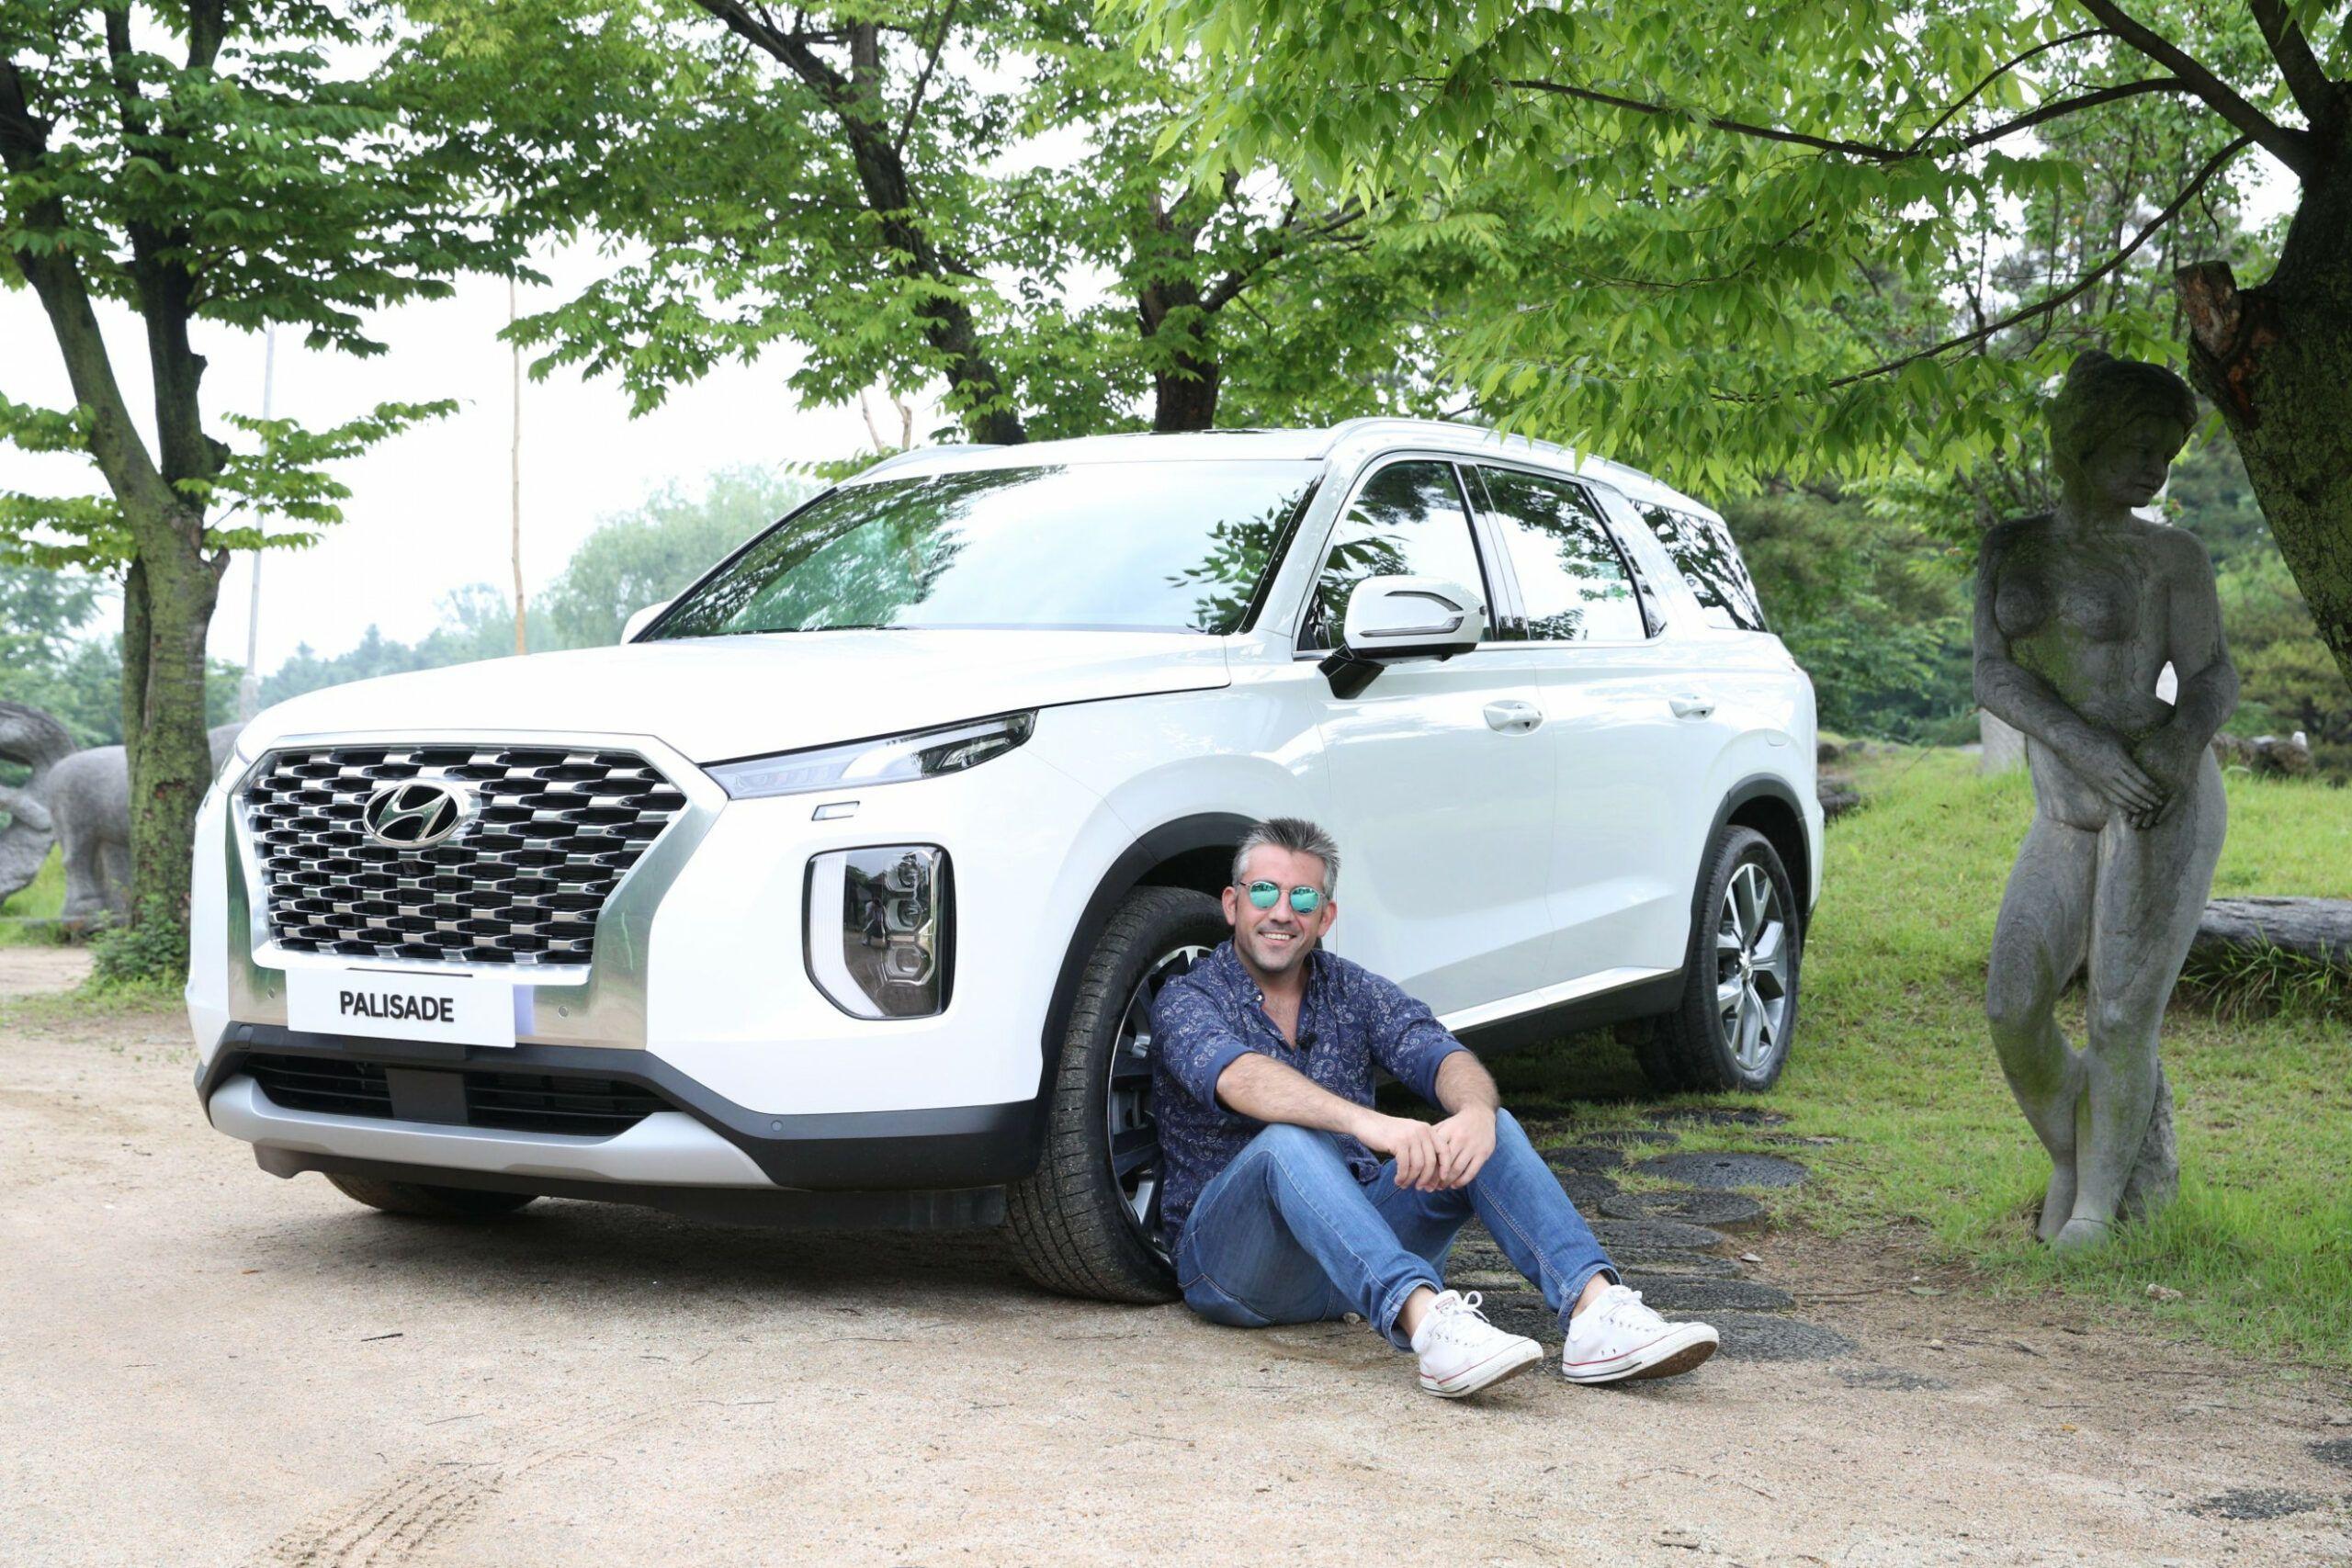 7 Picture 2020 Hyundai Palisade Price in 2020 Hyundai